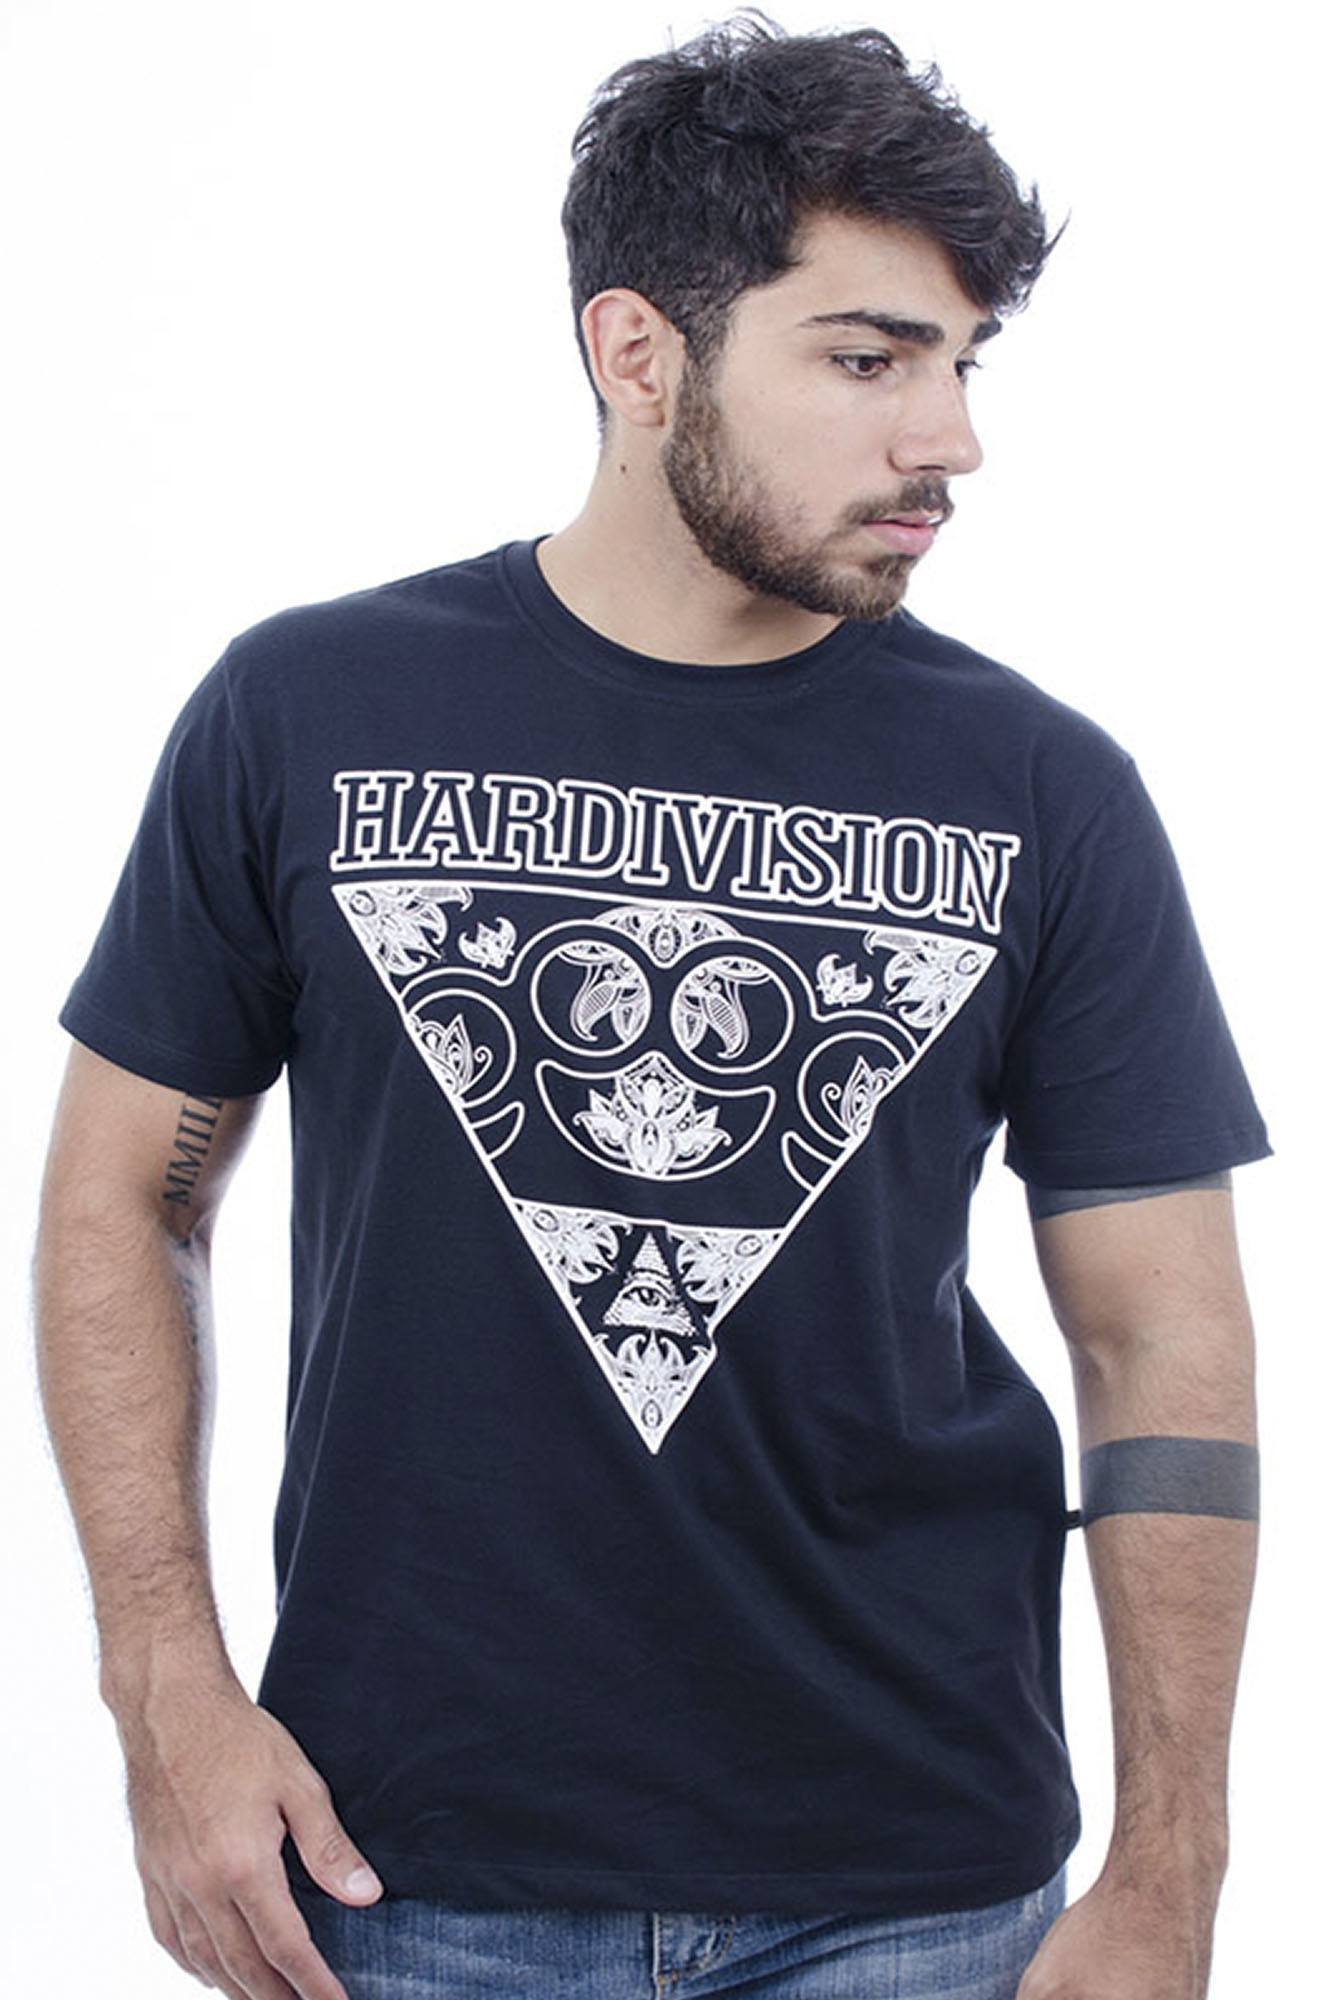 Camiseta MasculinaEstampada Skateboarder Preto Hardivision